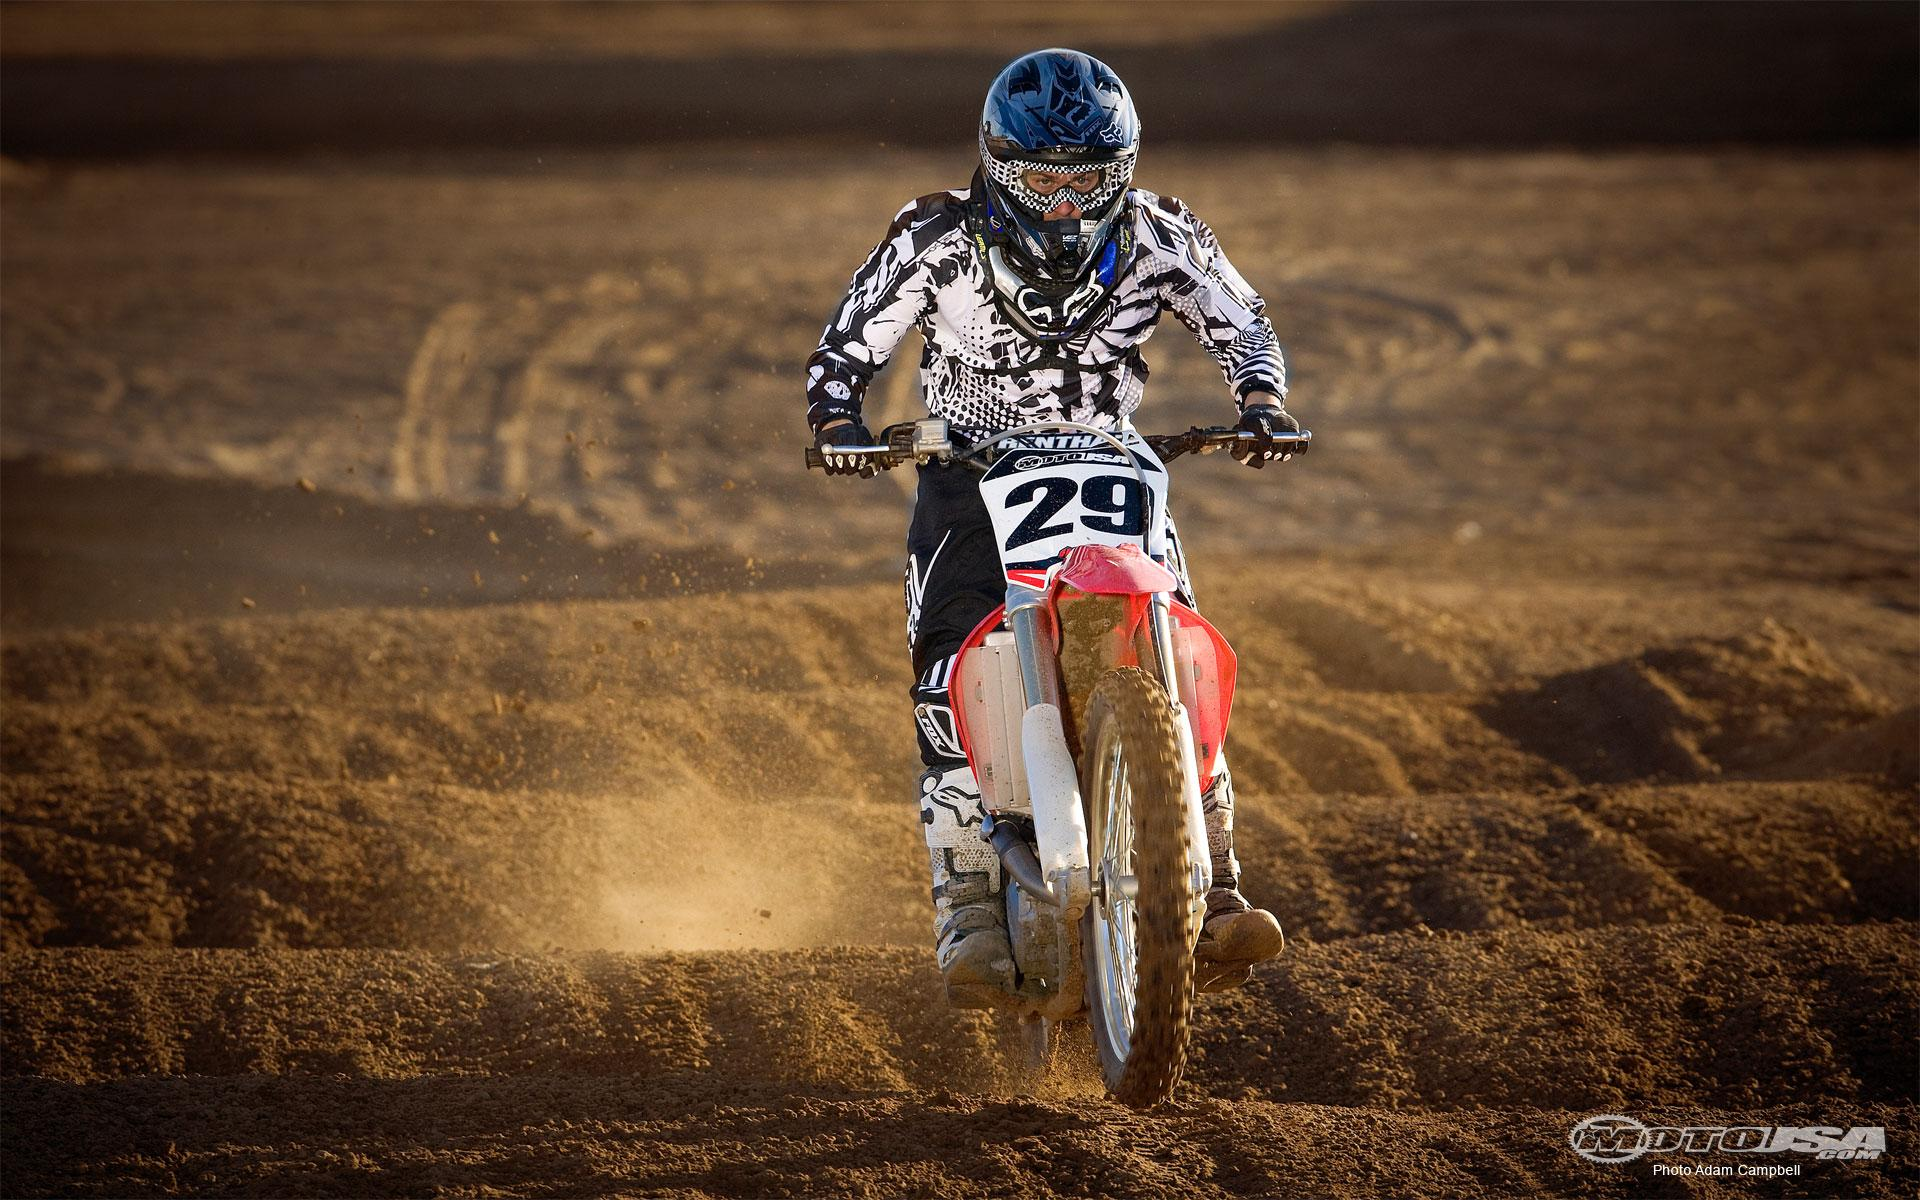 Motocross Honda Dirt Bike Wallpaper HD 5 Motorcycle High Resolution 1920x1200